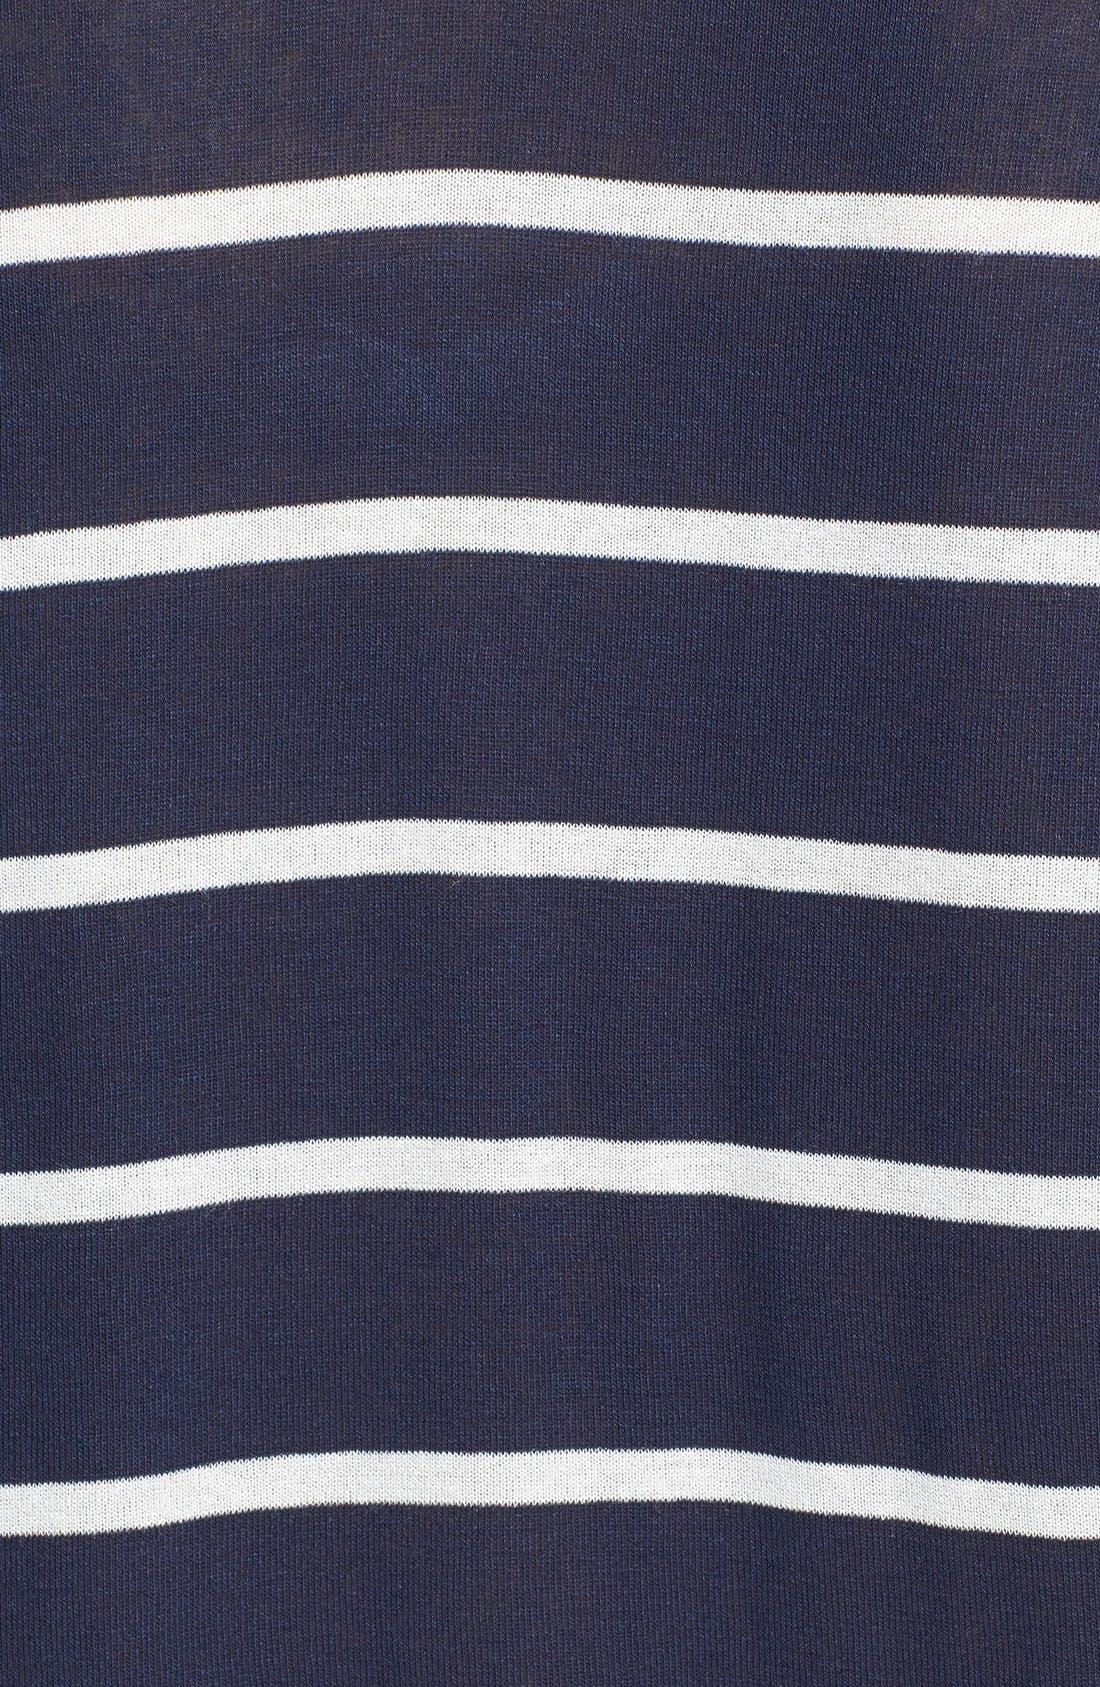 Alternate Image 3  - Splendid Stripe Jersey Pocket Tee